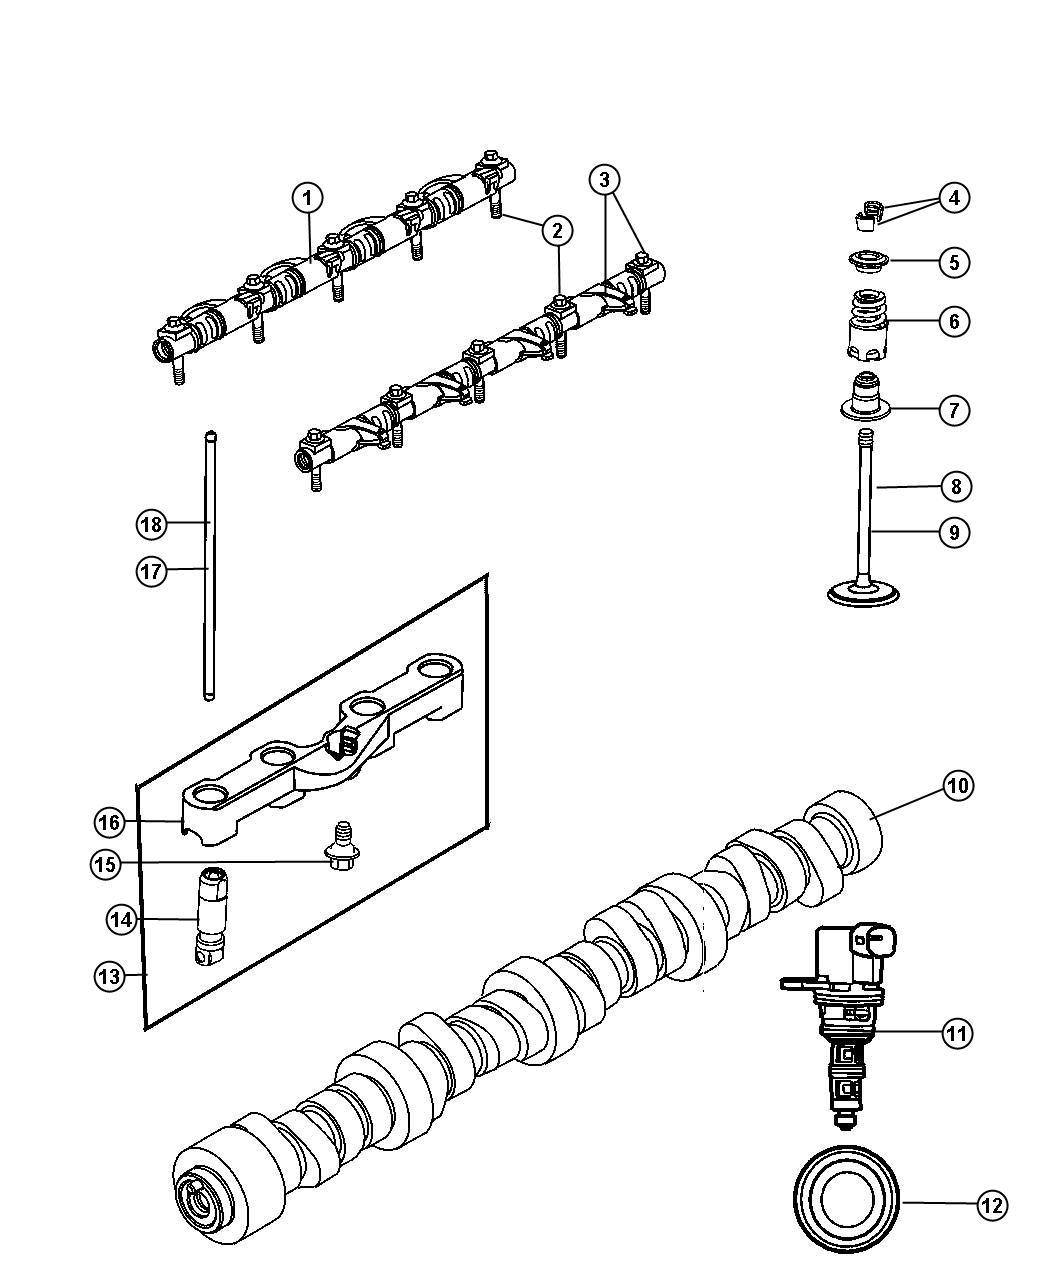 Dodge Ram 1500 Yoke. Tappet aligning. Rear. [49], [engine